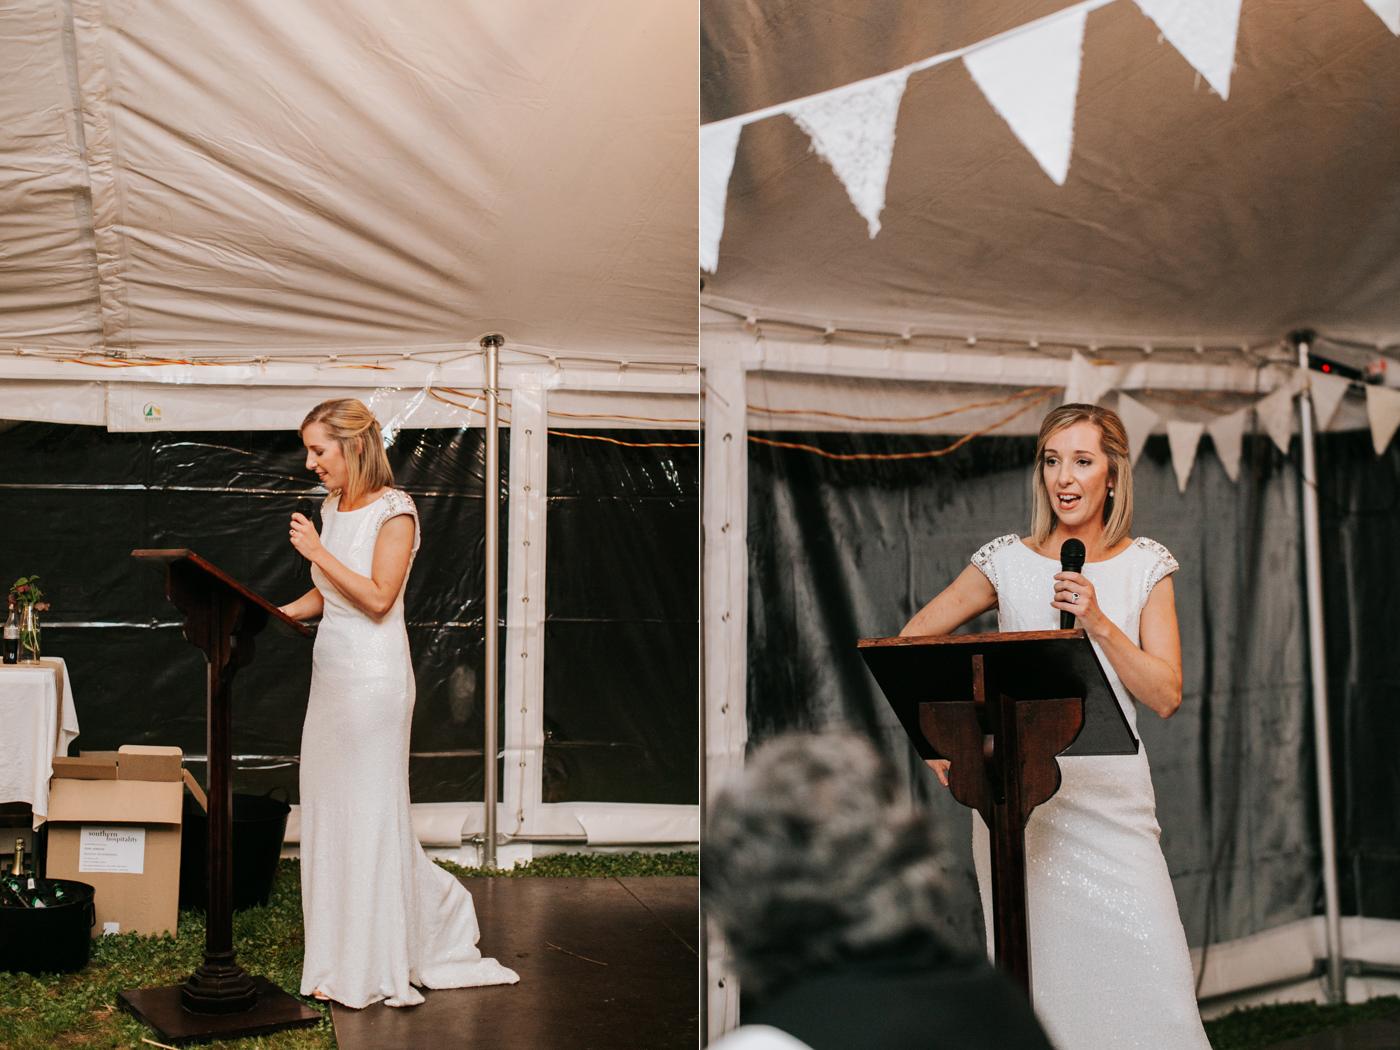 Bridget & James - Orange Country Wedding - Samantha Heather Photography-252.jpg